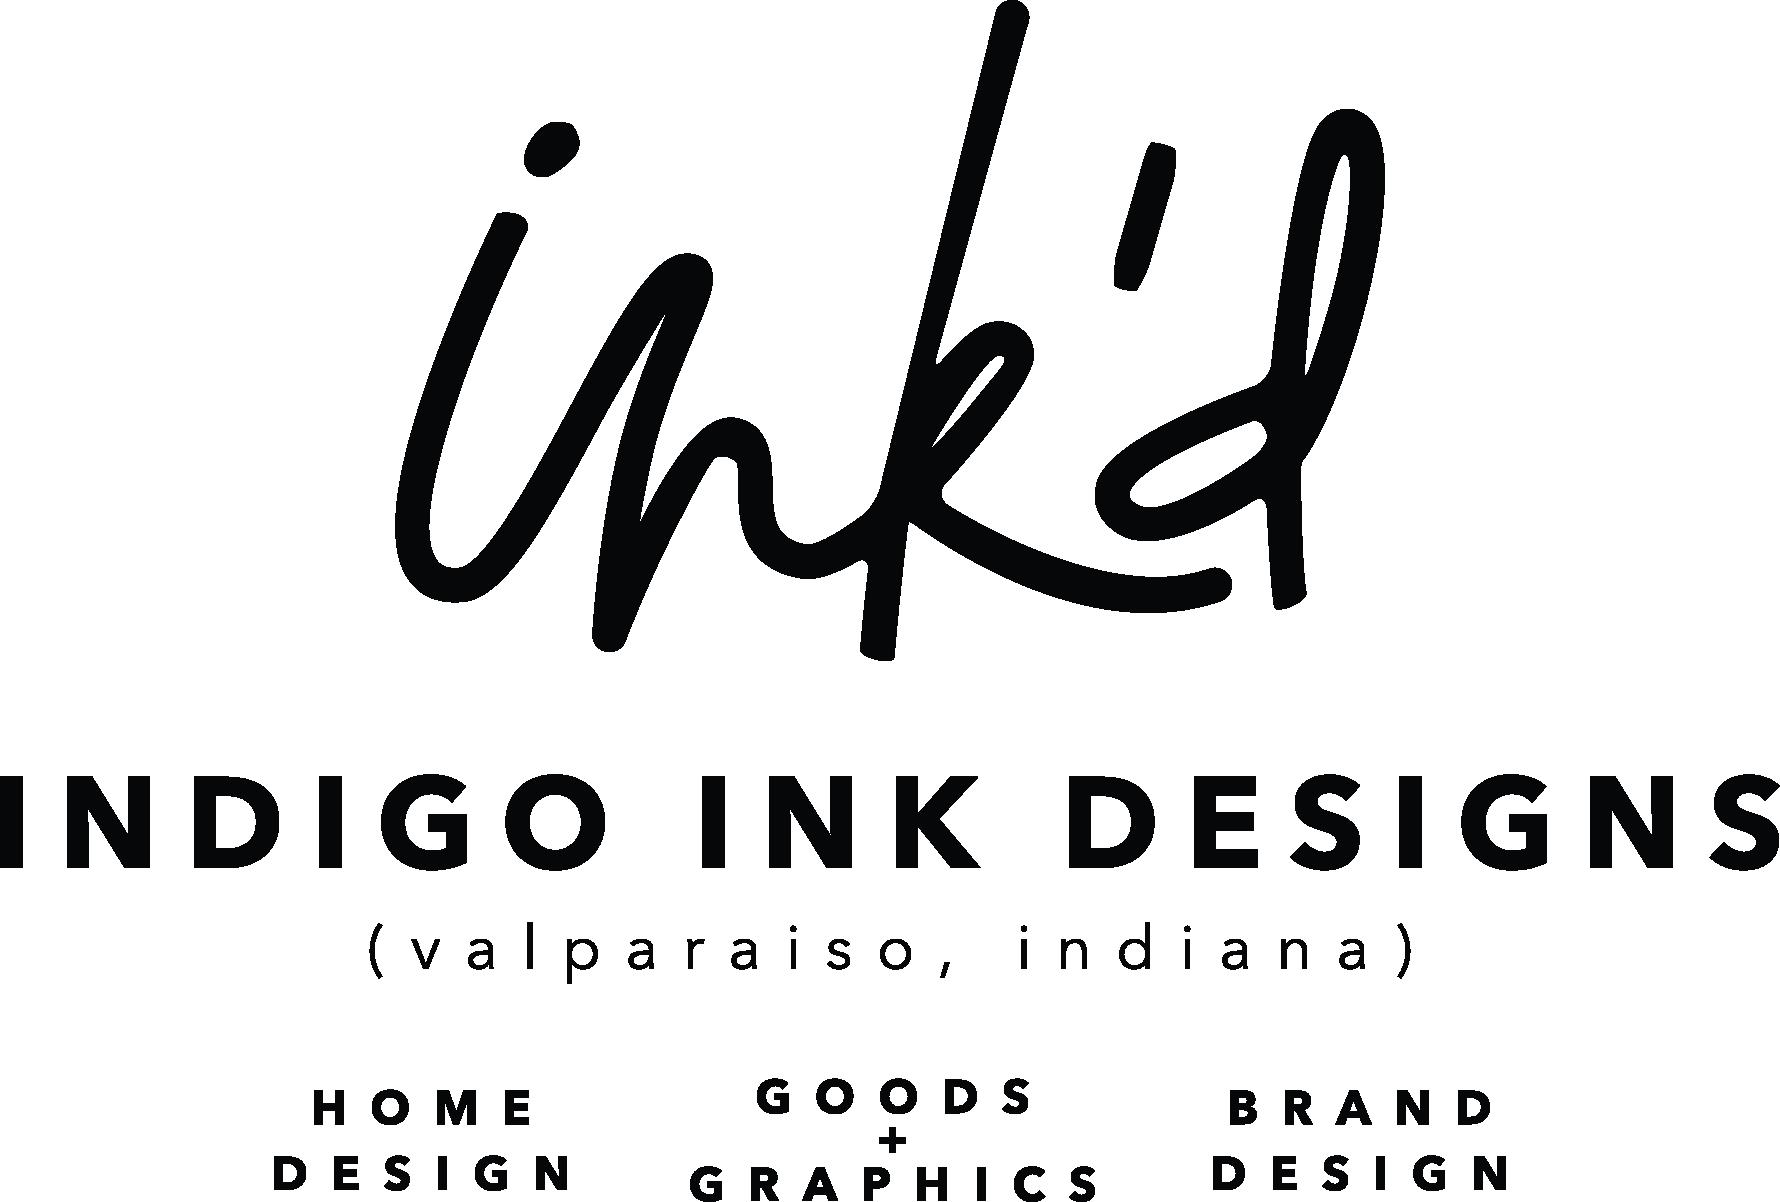 iNK'd : Indigo Ink Designs